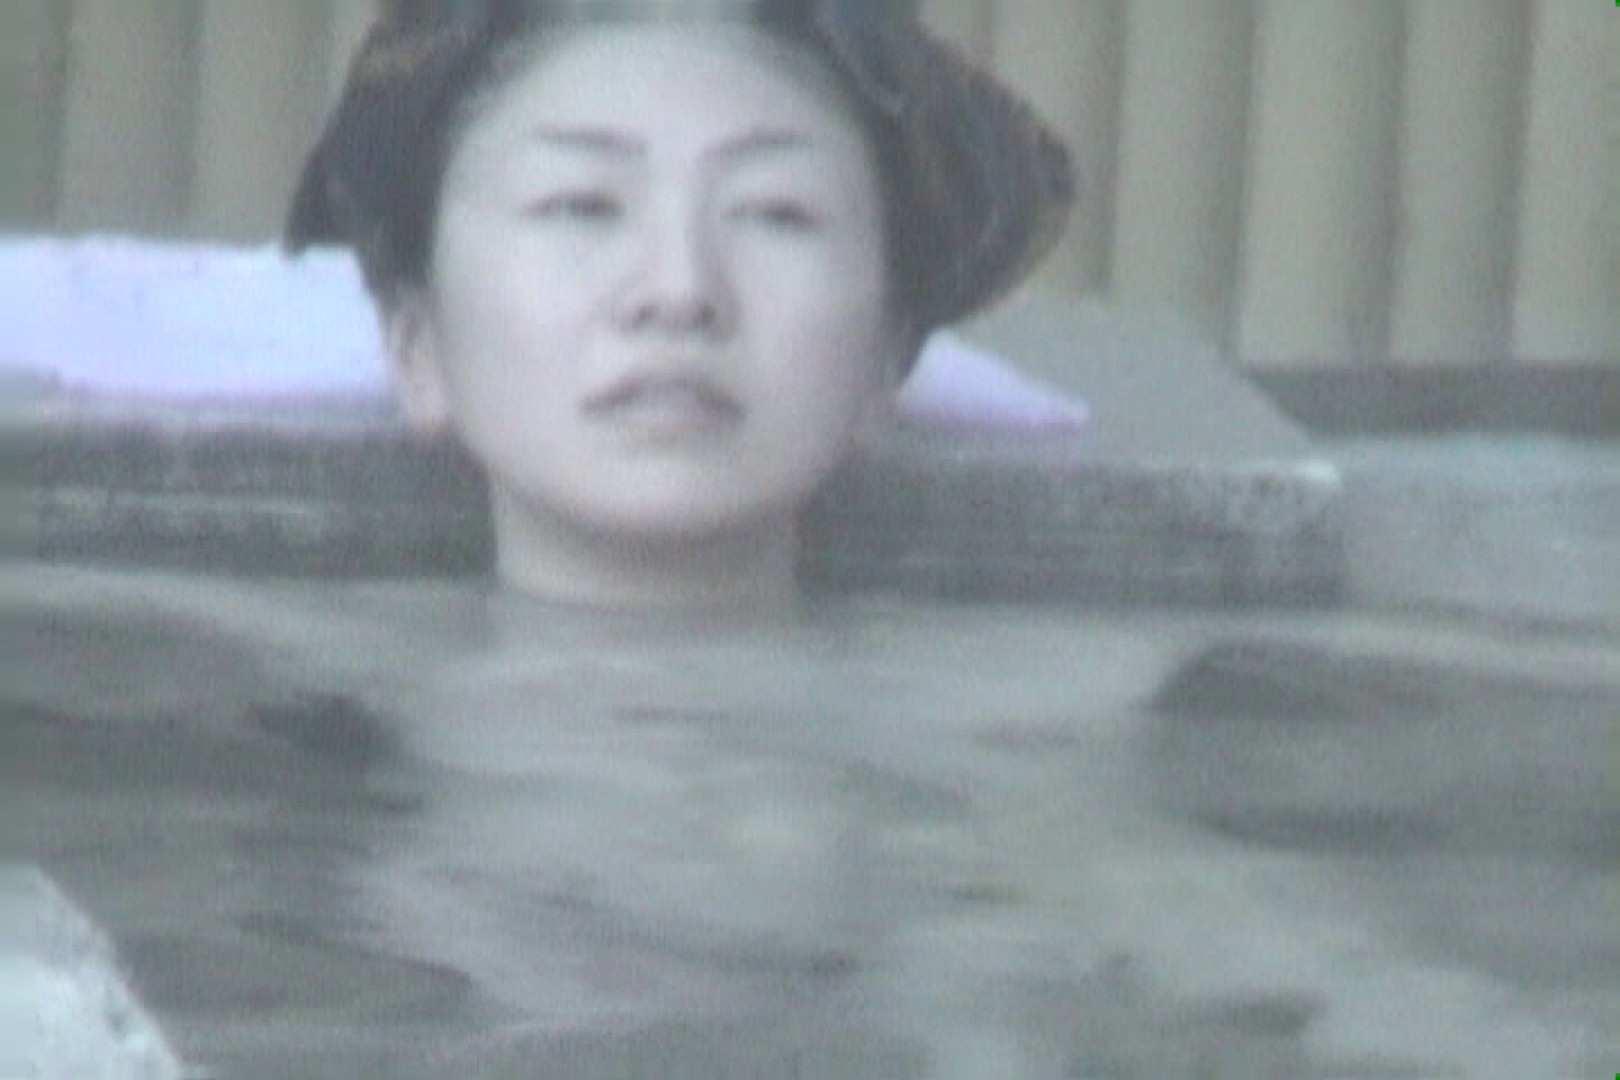 Aquaな露天風呂Vol.607 盗撮シリーズ | 露天風呂編  107PIX 93